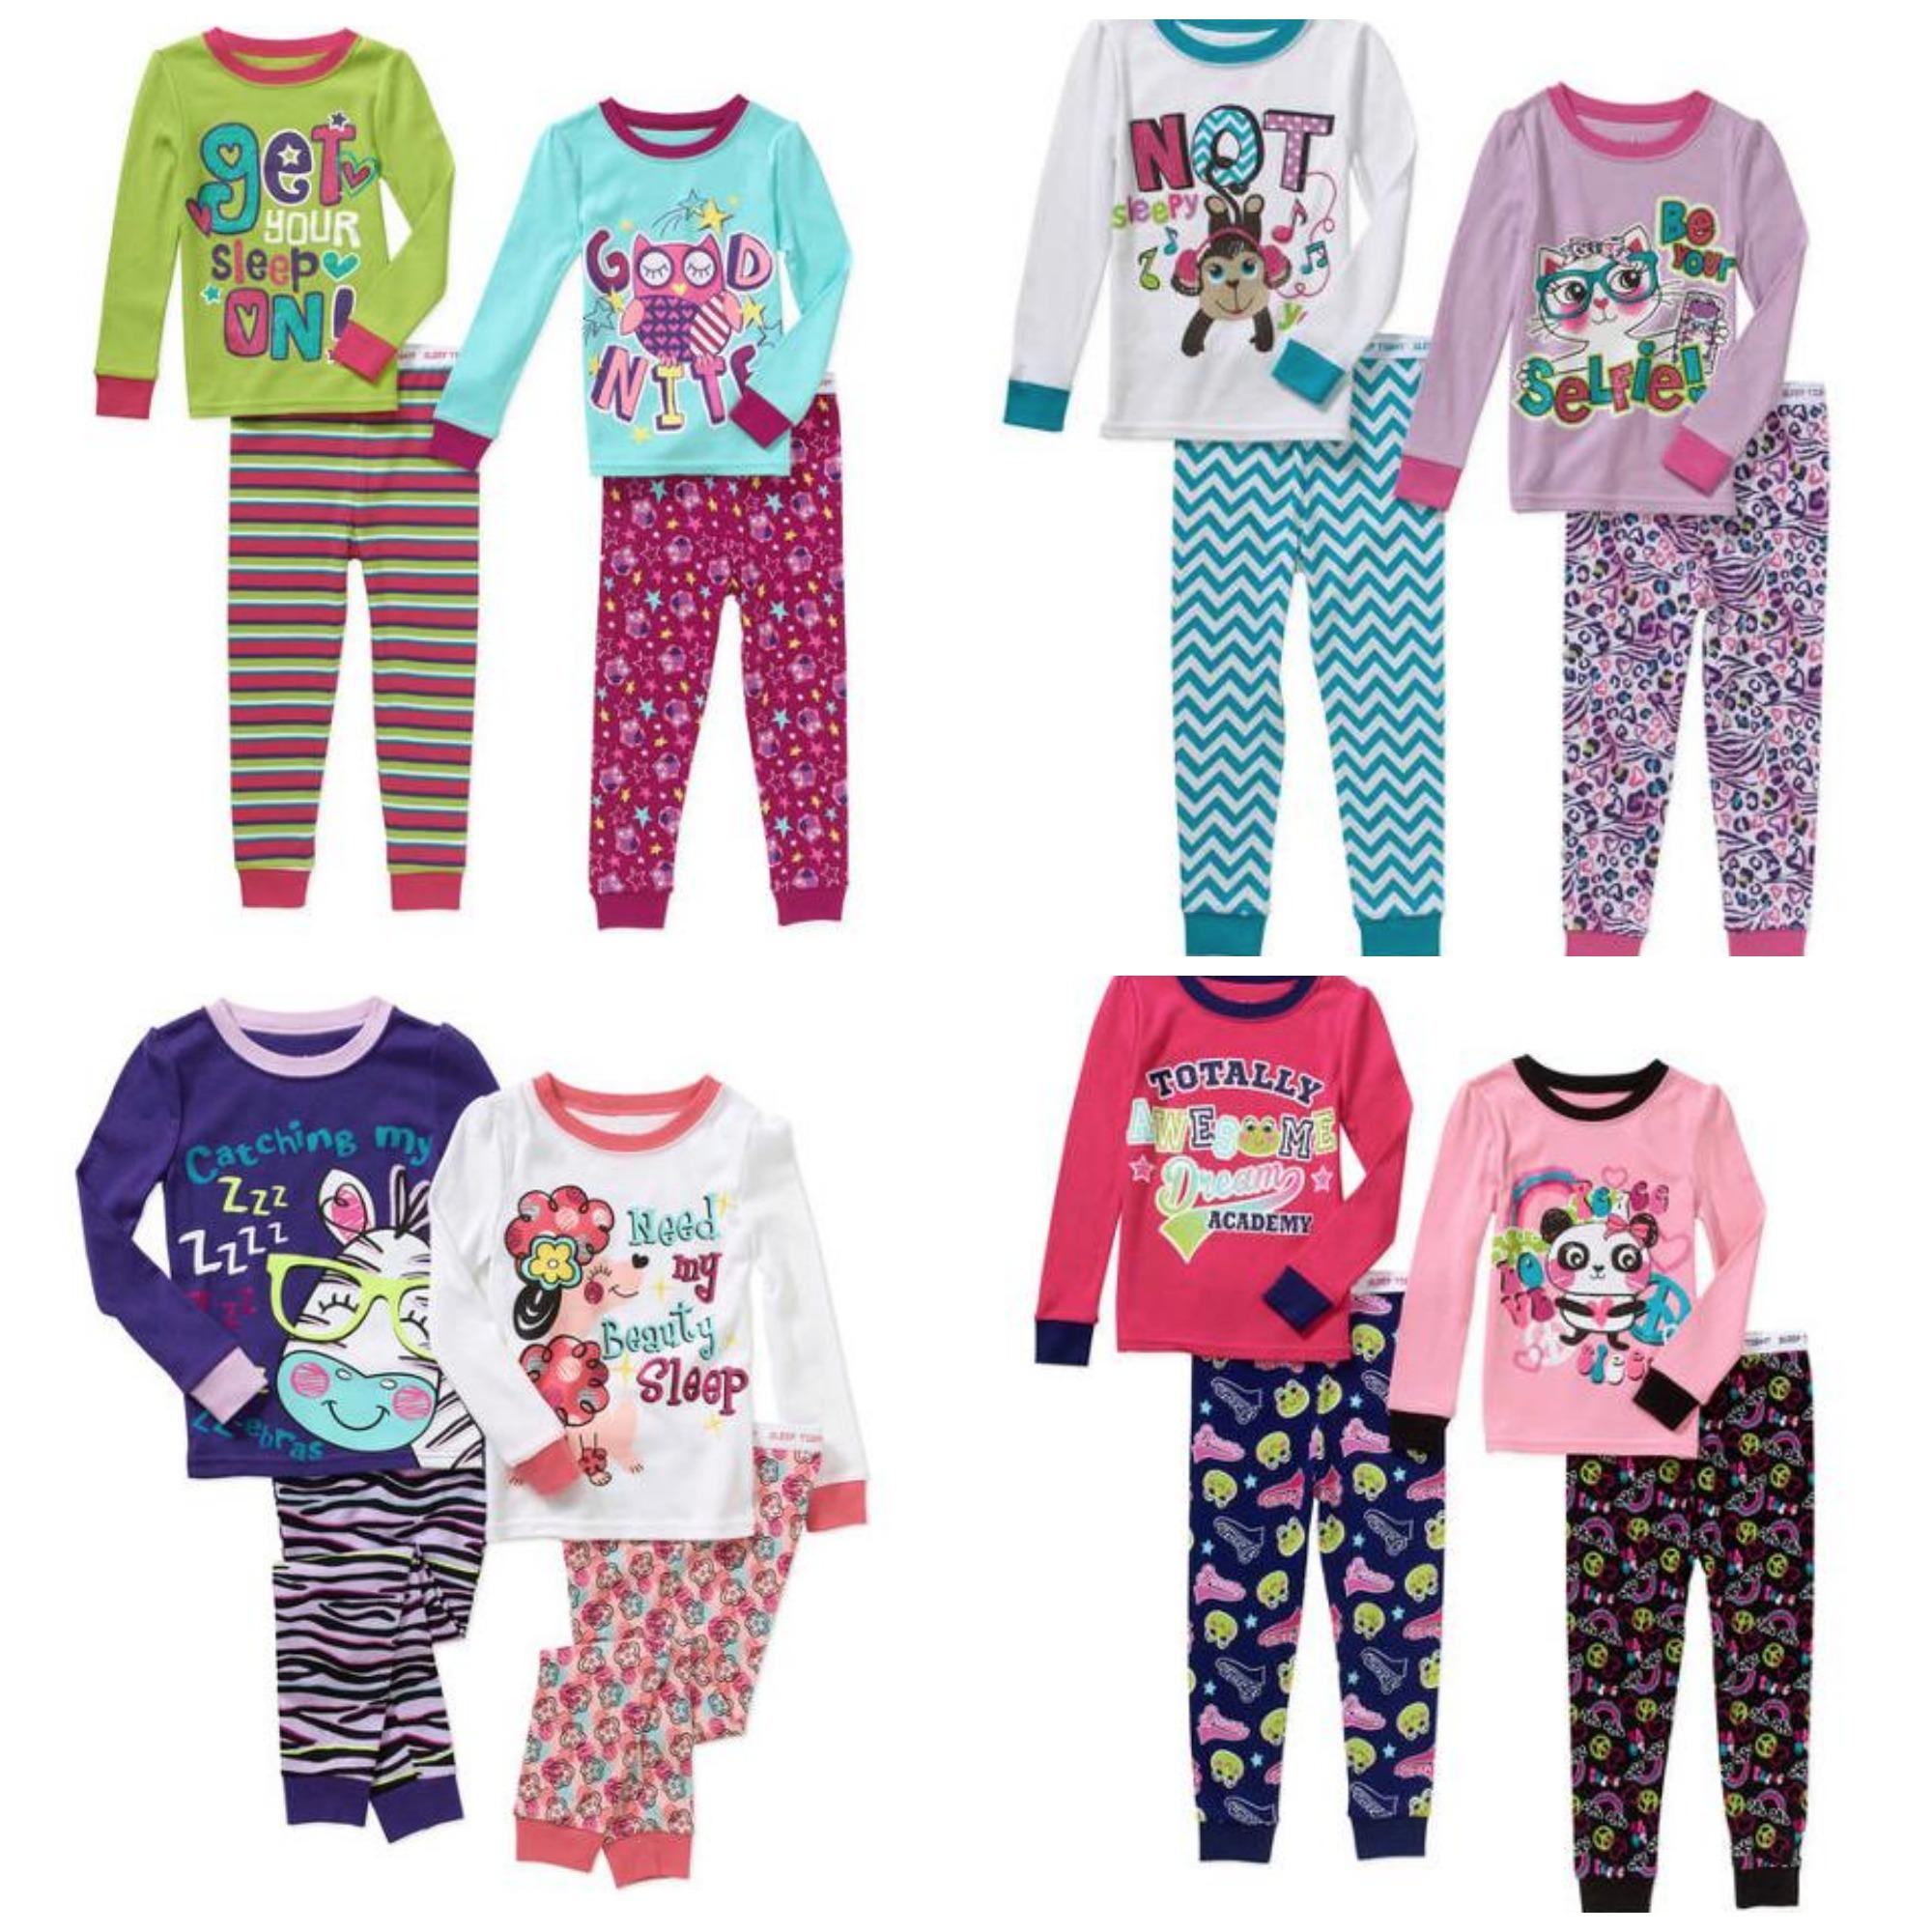 0cf64aa681 ... freebies2deals-pjs5 Girl s Garanimals Baby Toddler Girl Cotton Tight  Fit Pajamas ...